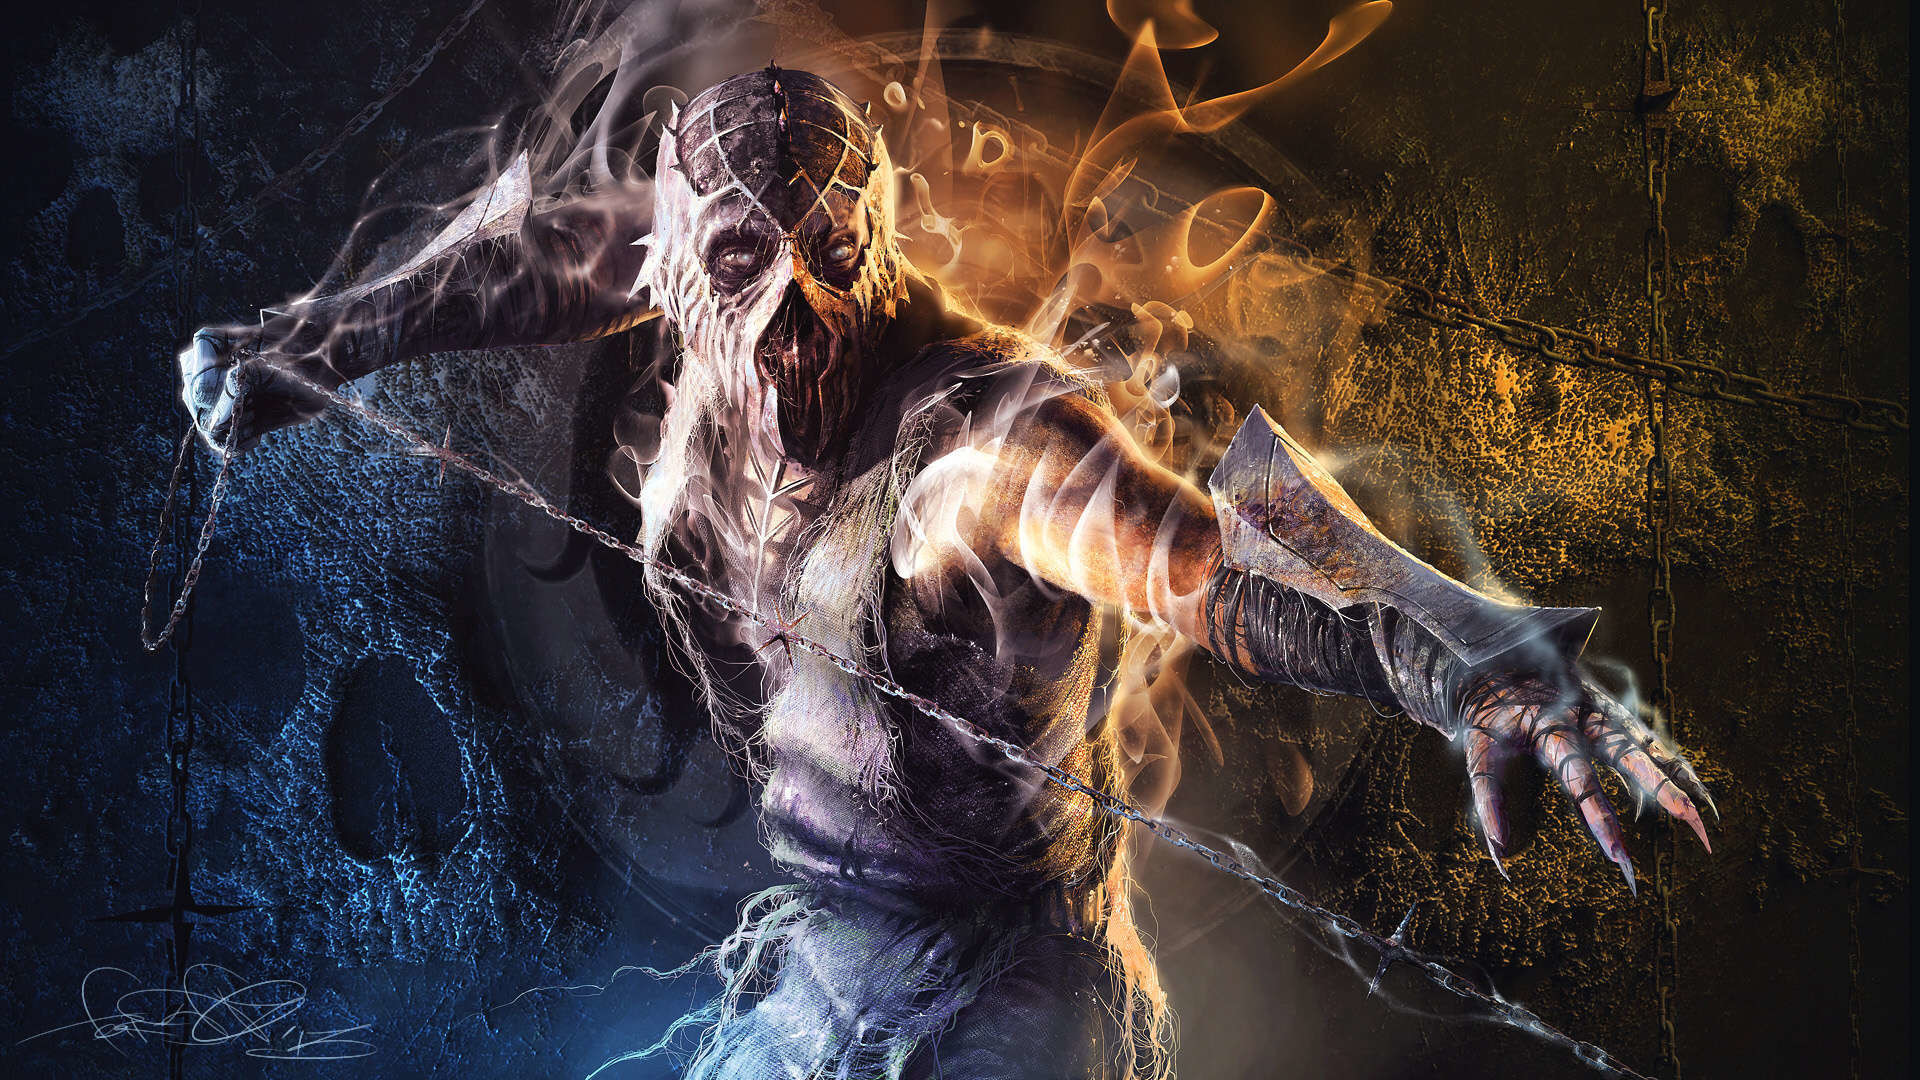 Mortal Kombat X Wallpaper HD smoke characters 1920 x 1080